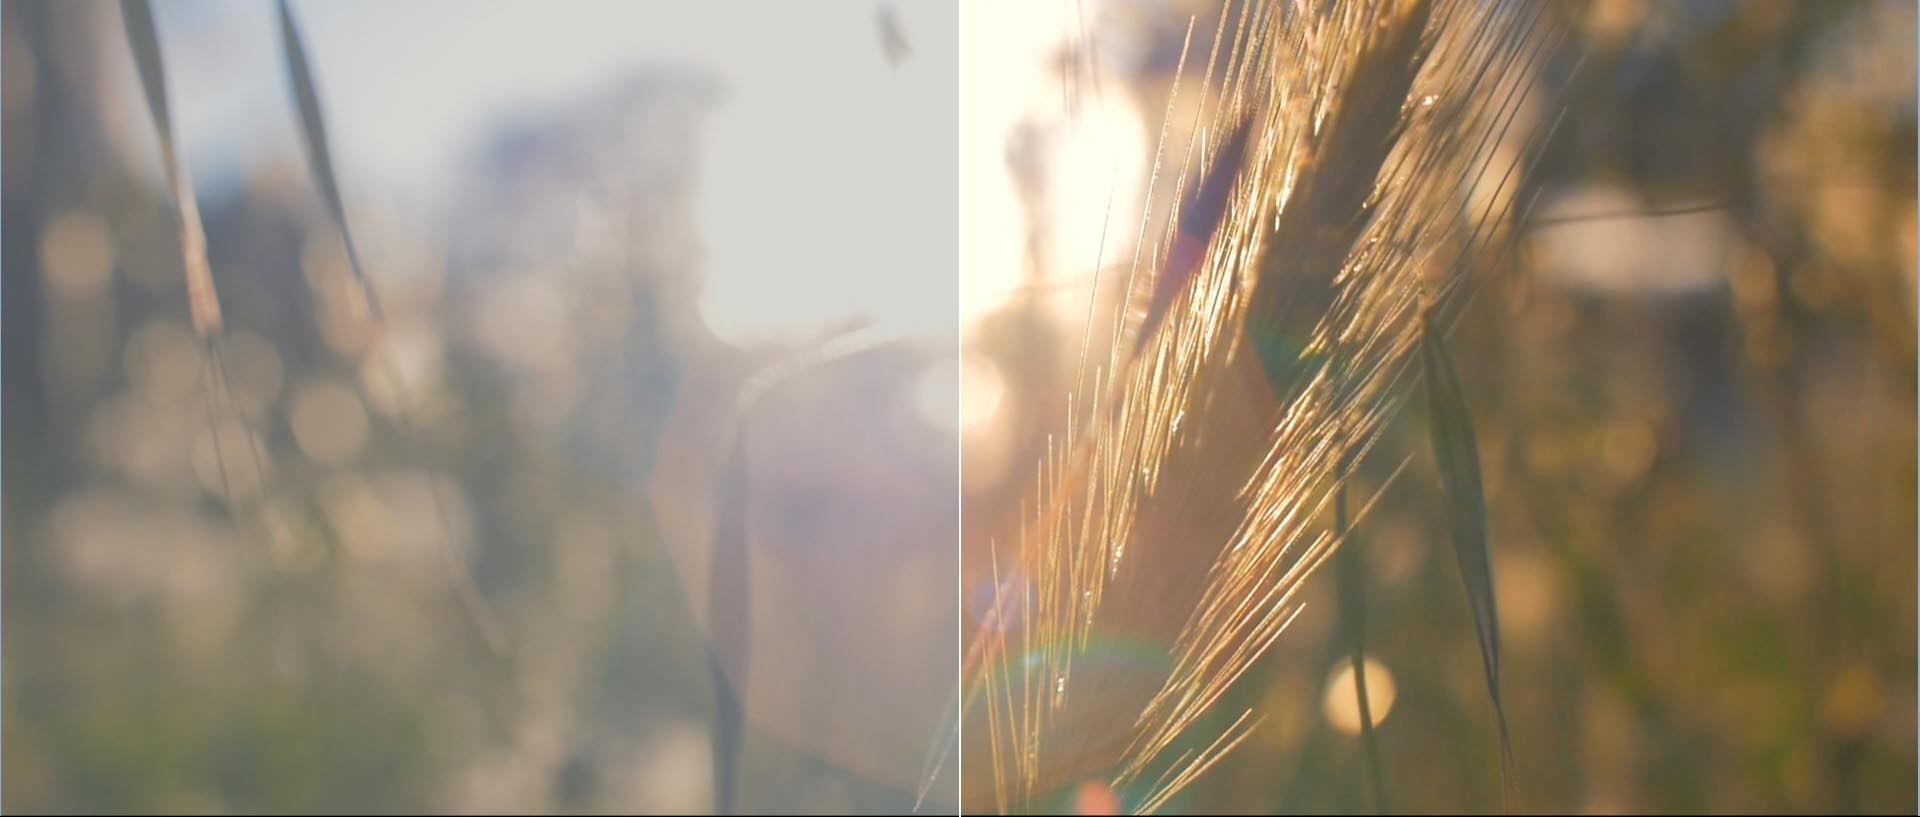 virtual art SIERRA MARIOLA color grade empresa etalonaje valencia barcelona madrid bilbao sevilla zaragoza visual art color grading